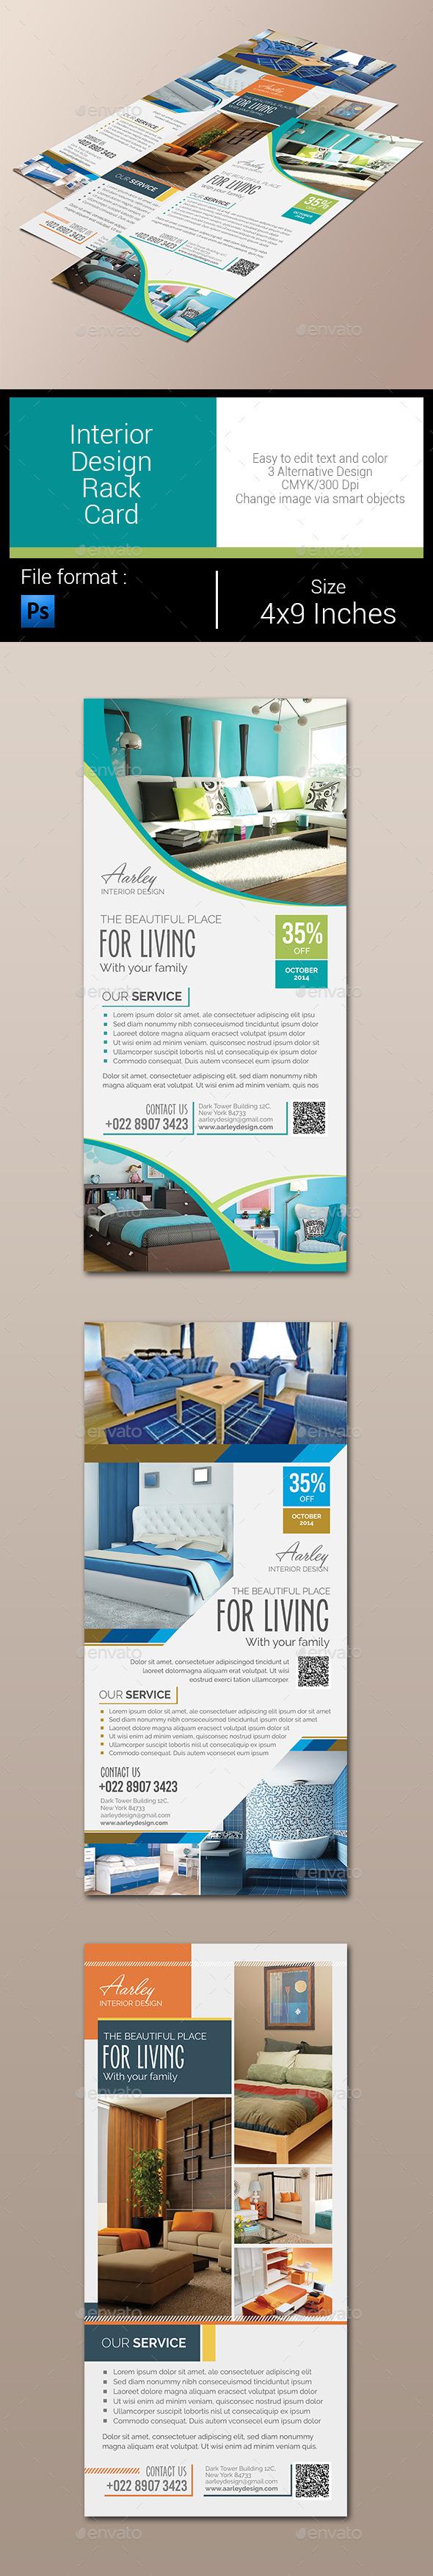 Interior Design Rack Card - Corporate Flyers